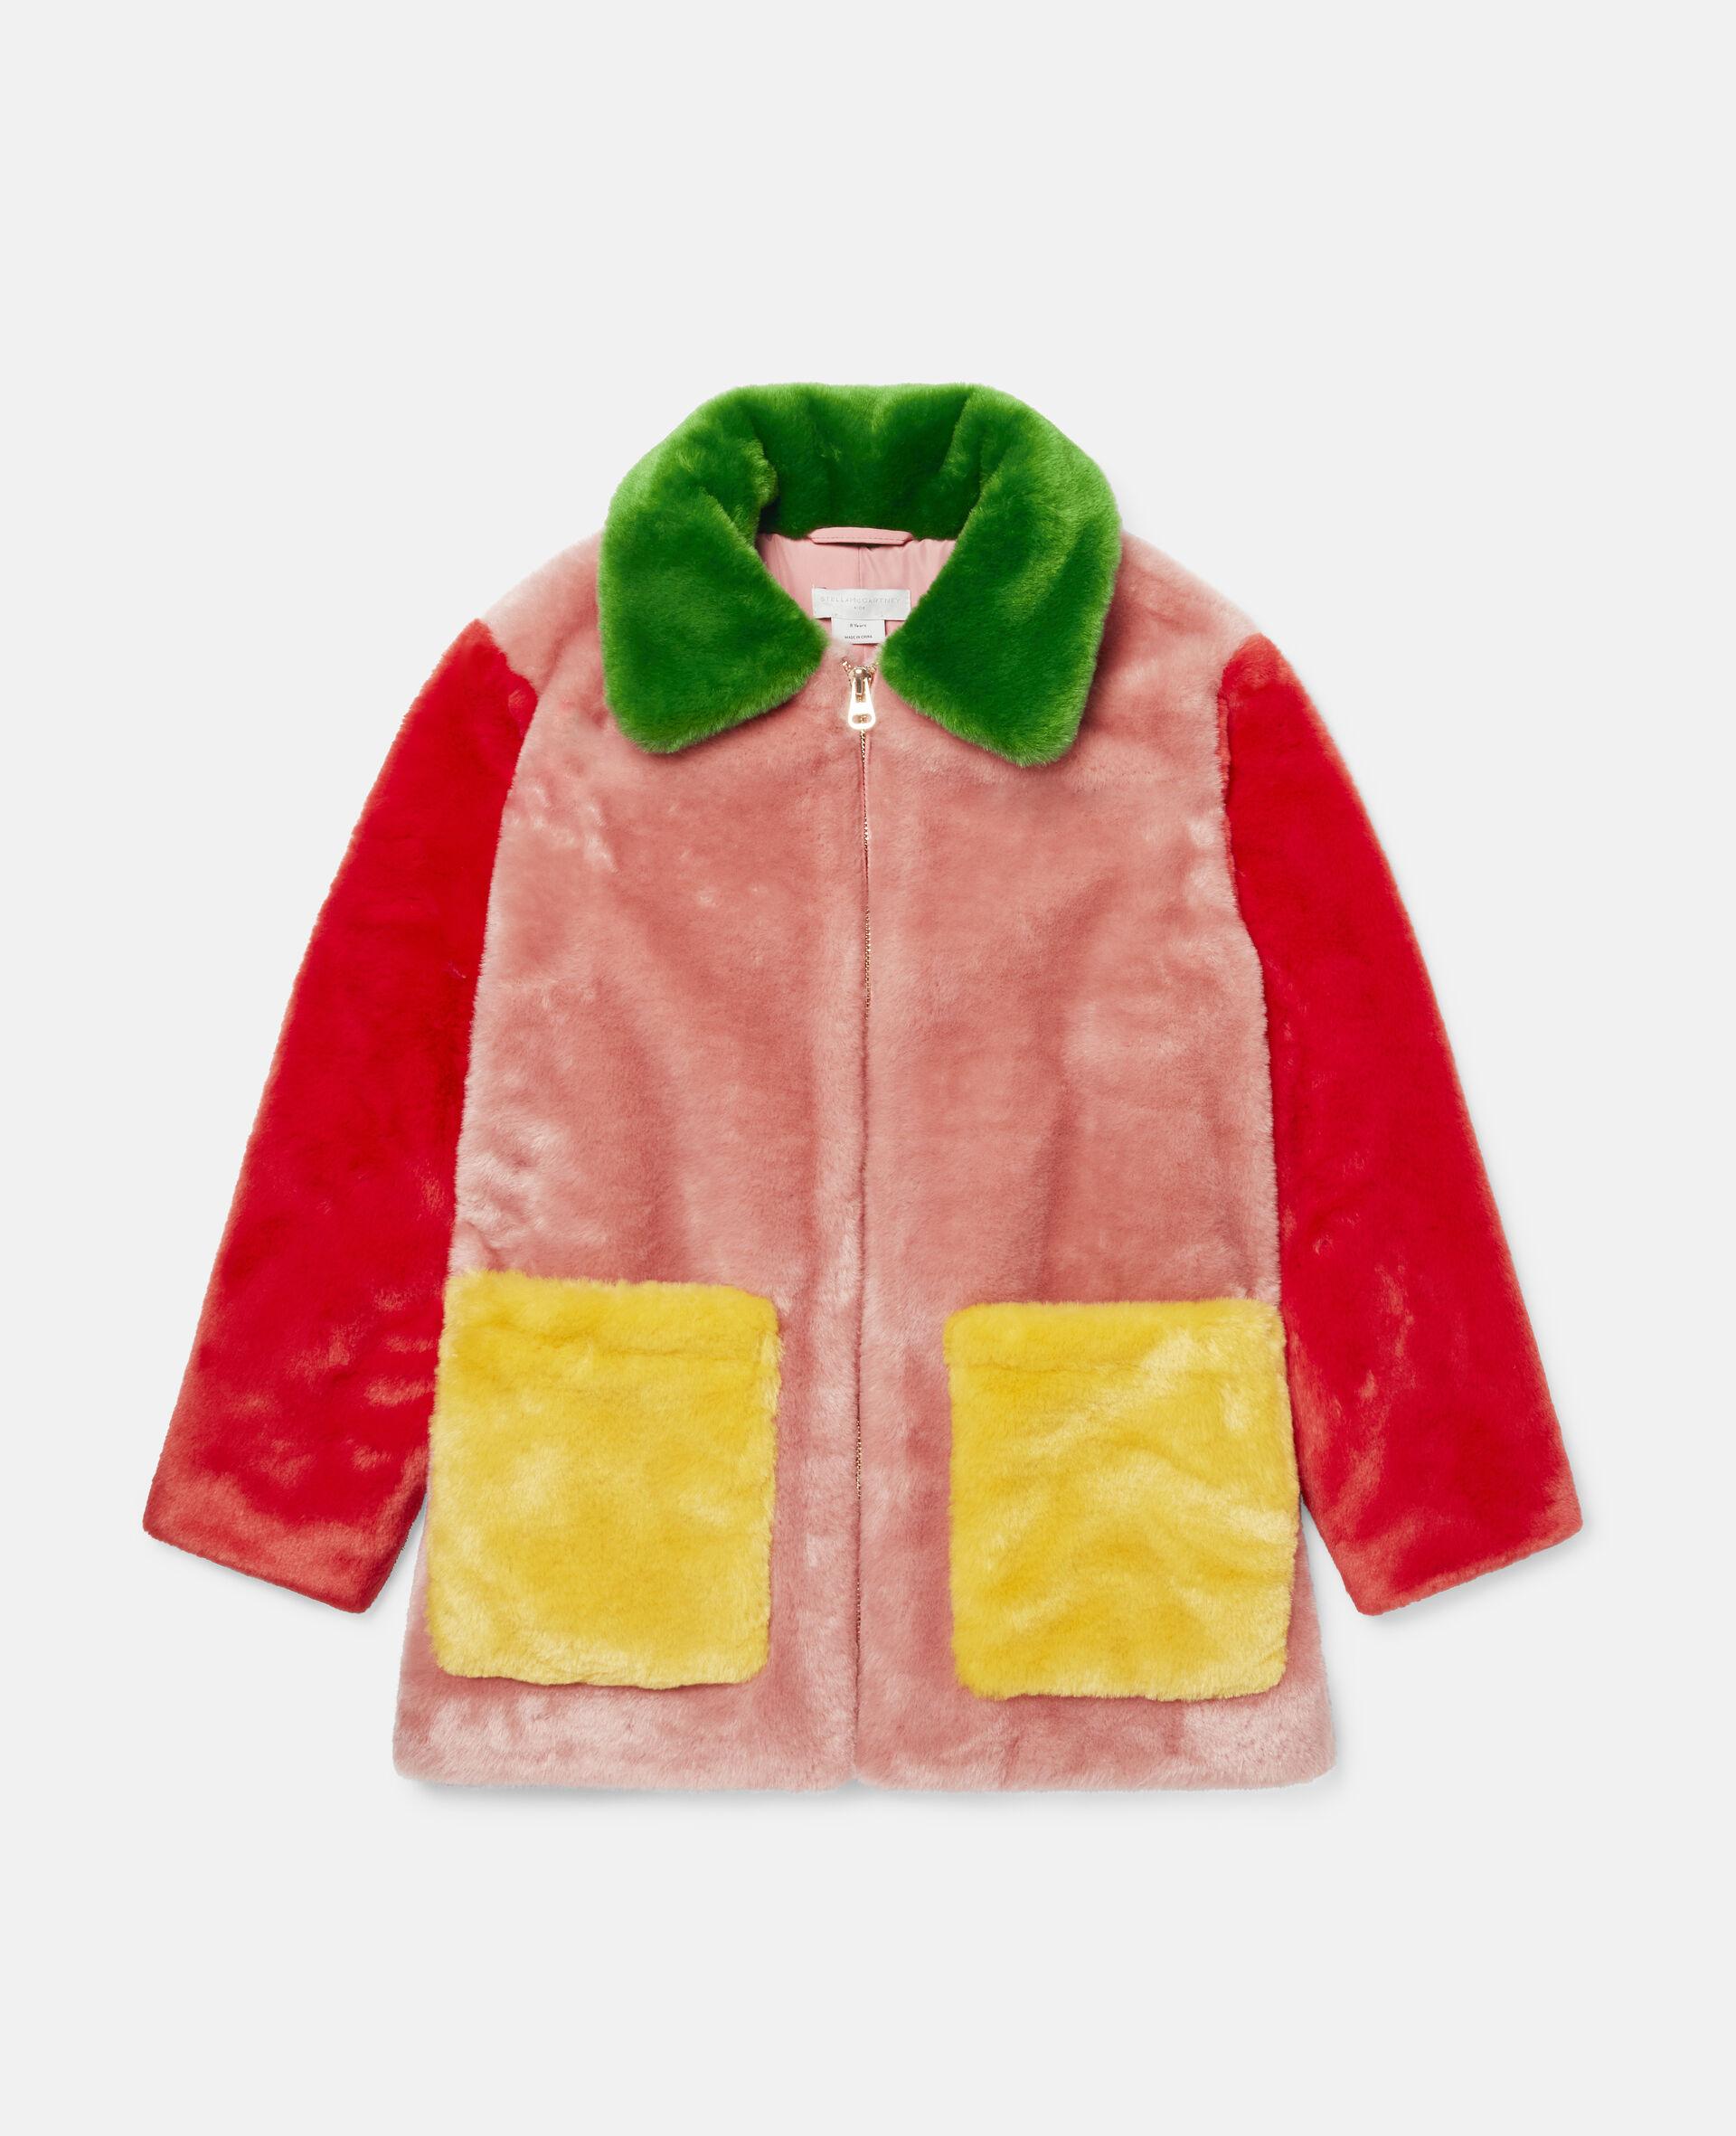 Mantel im Blockfarben-Design aus FFF-Bunt-large image number 0